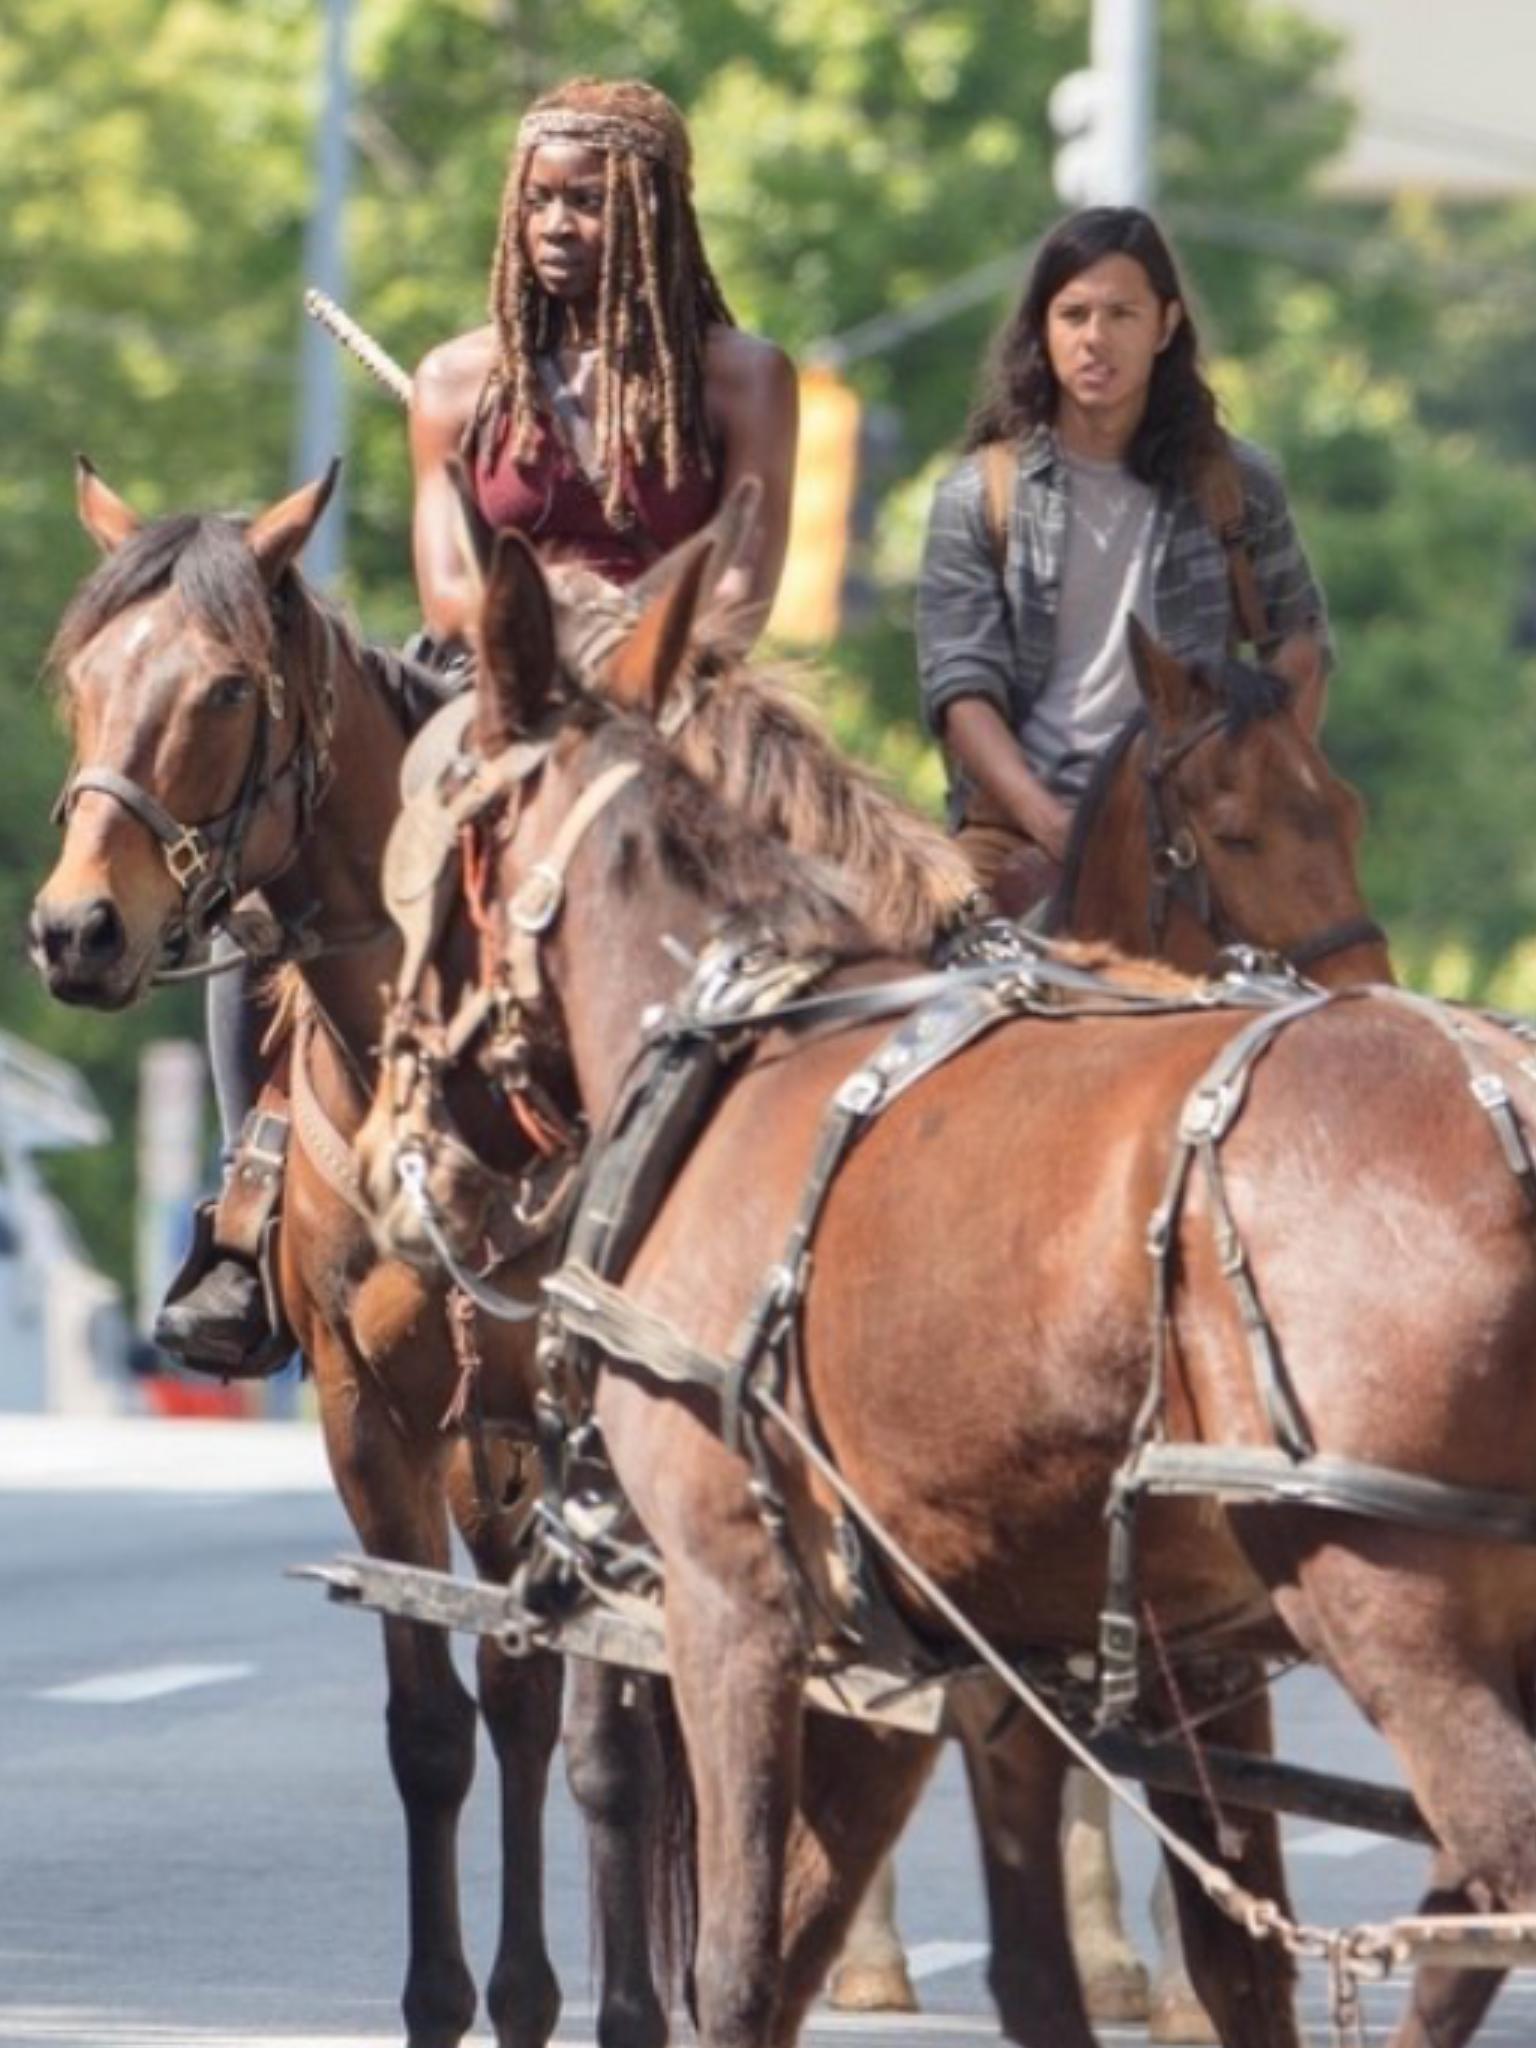 Behind the Scenes on The Walking Dead Season 9 Walking Dead Season 9, The  Walking